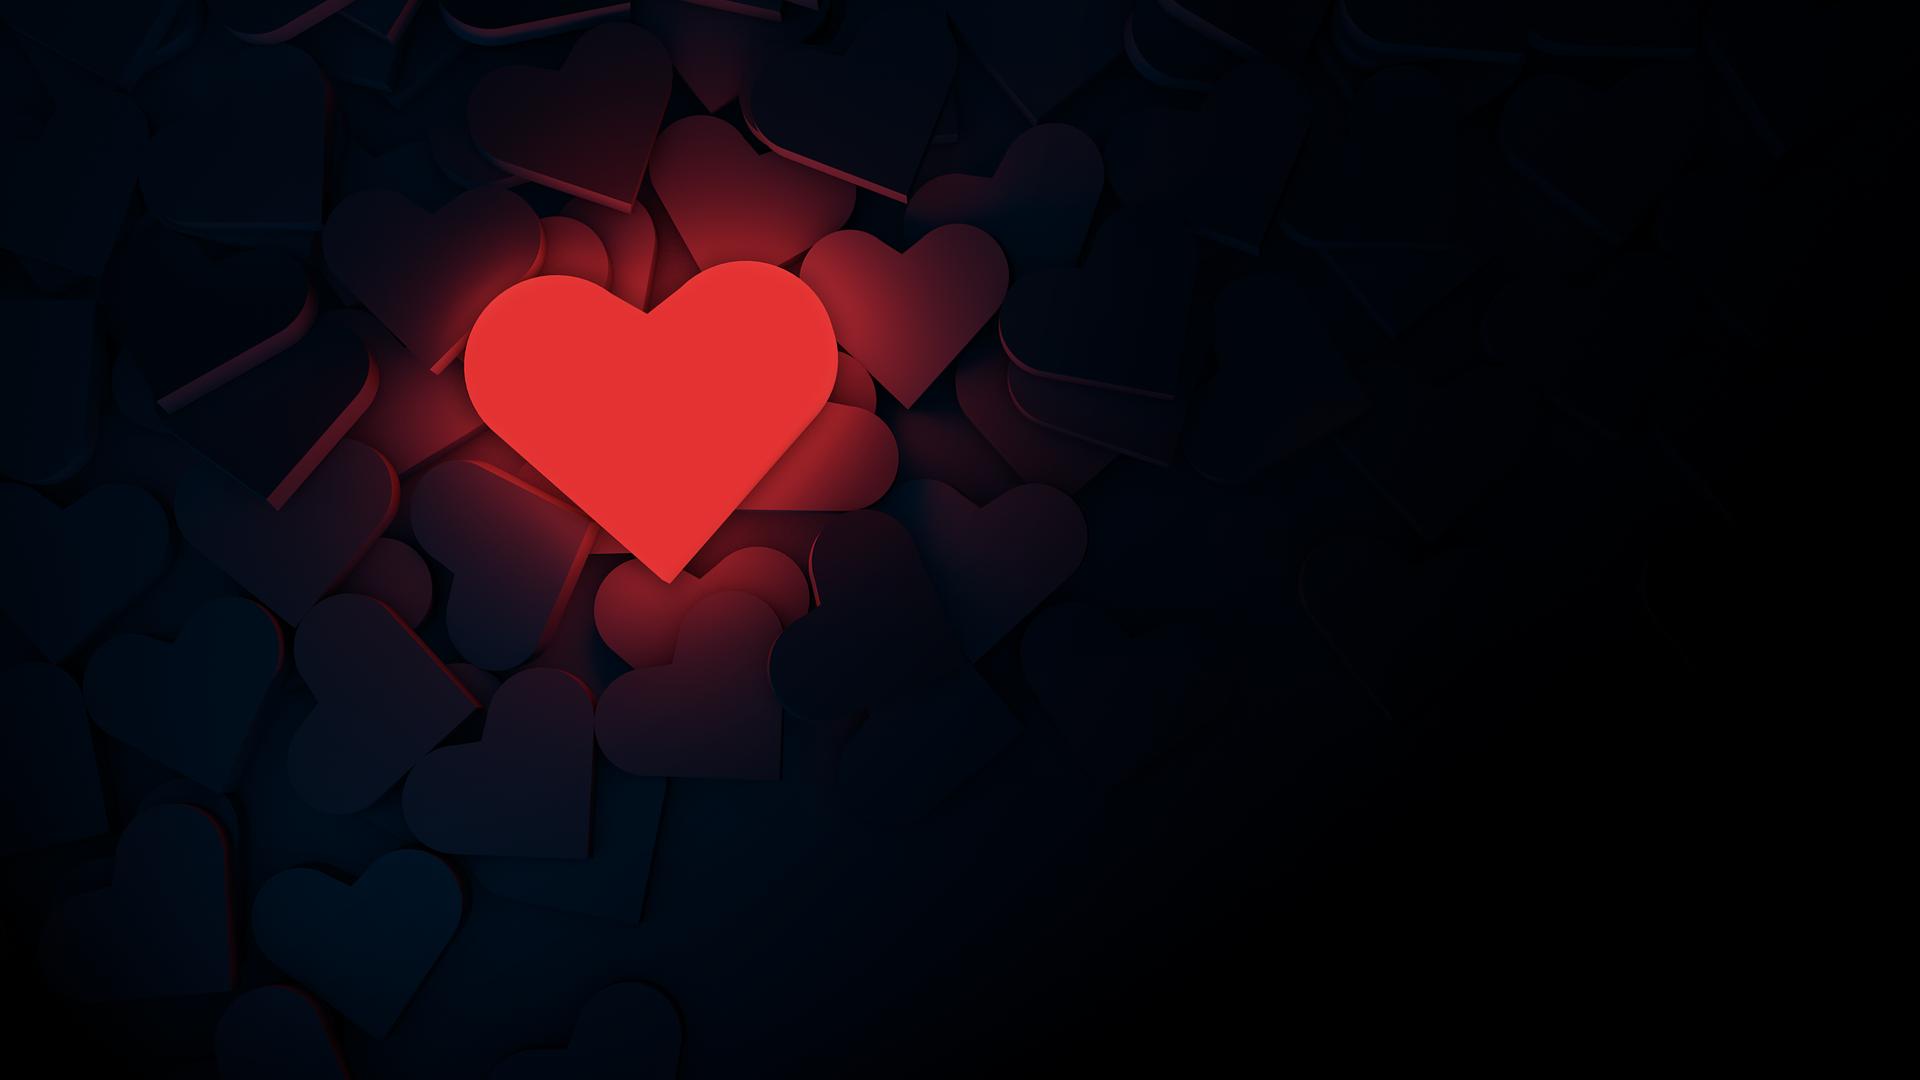 heart-3293531_1920